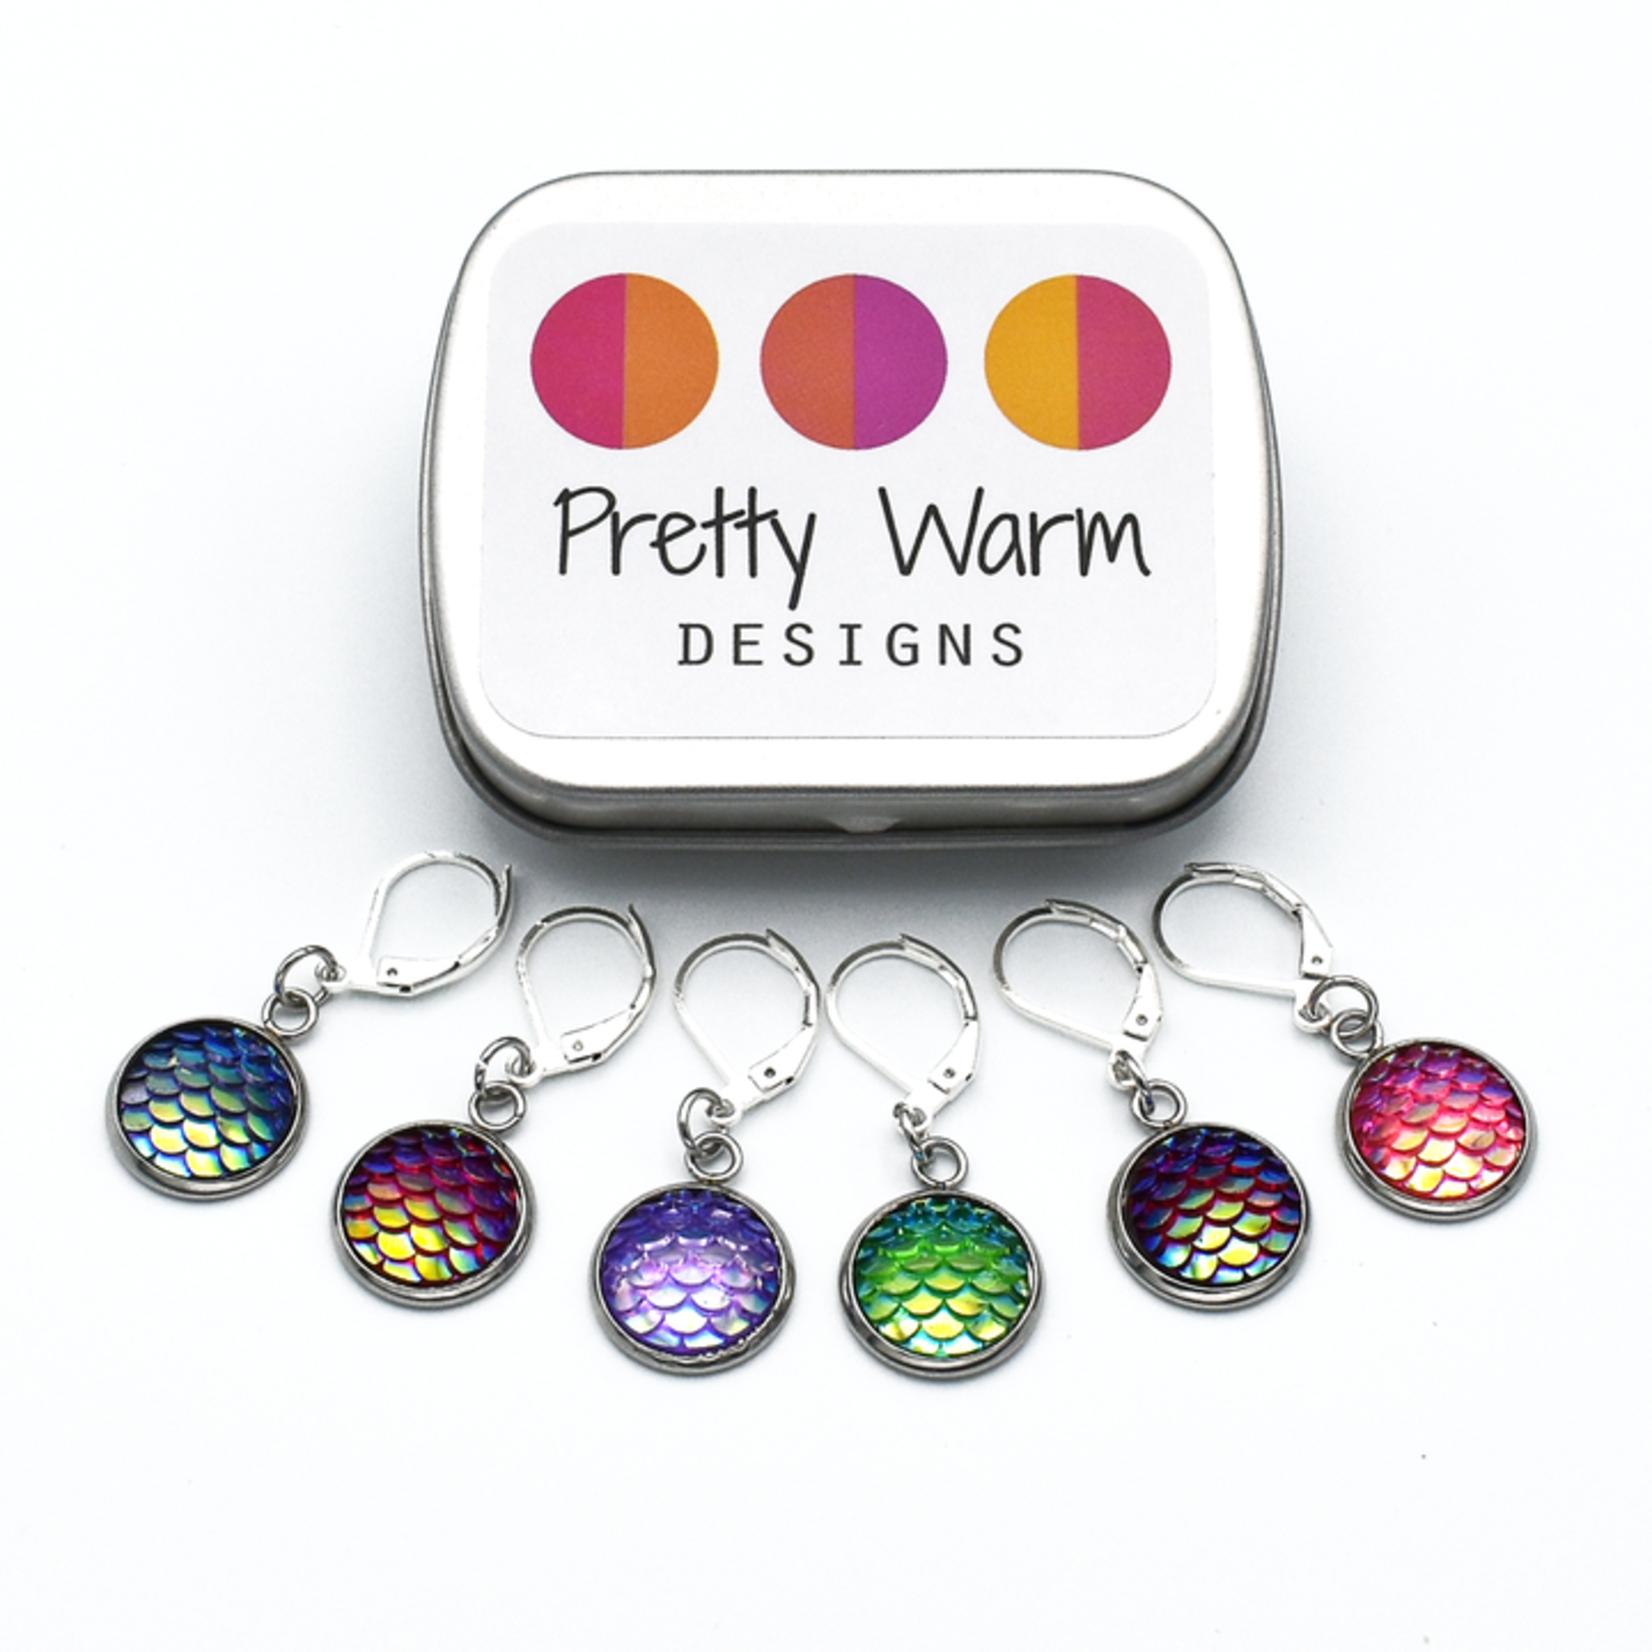 Pretty Warm Designs Stitch Markers by Pretty Warm Designs